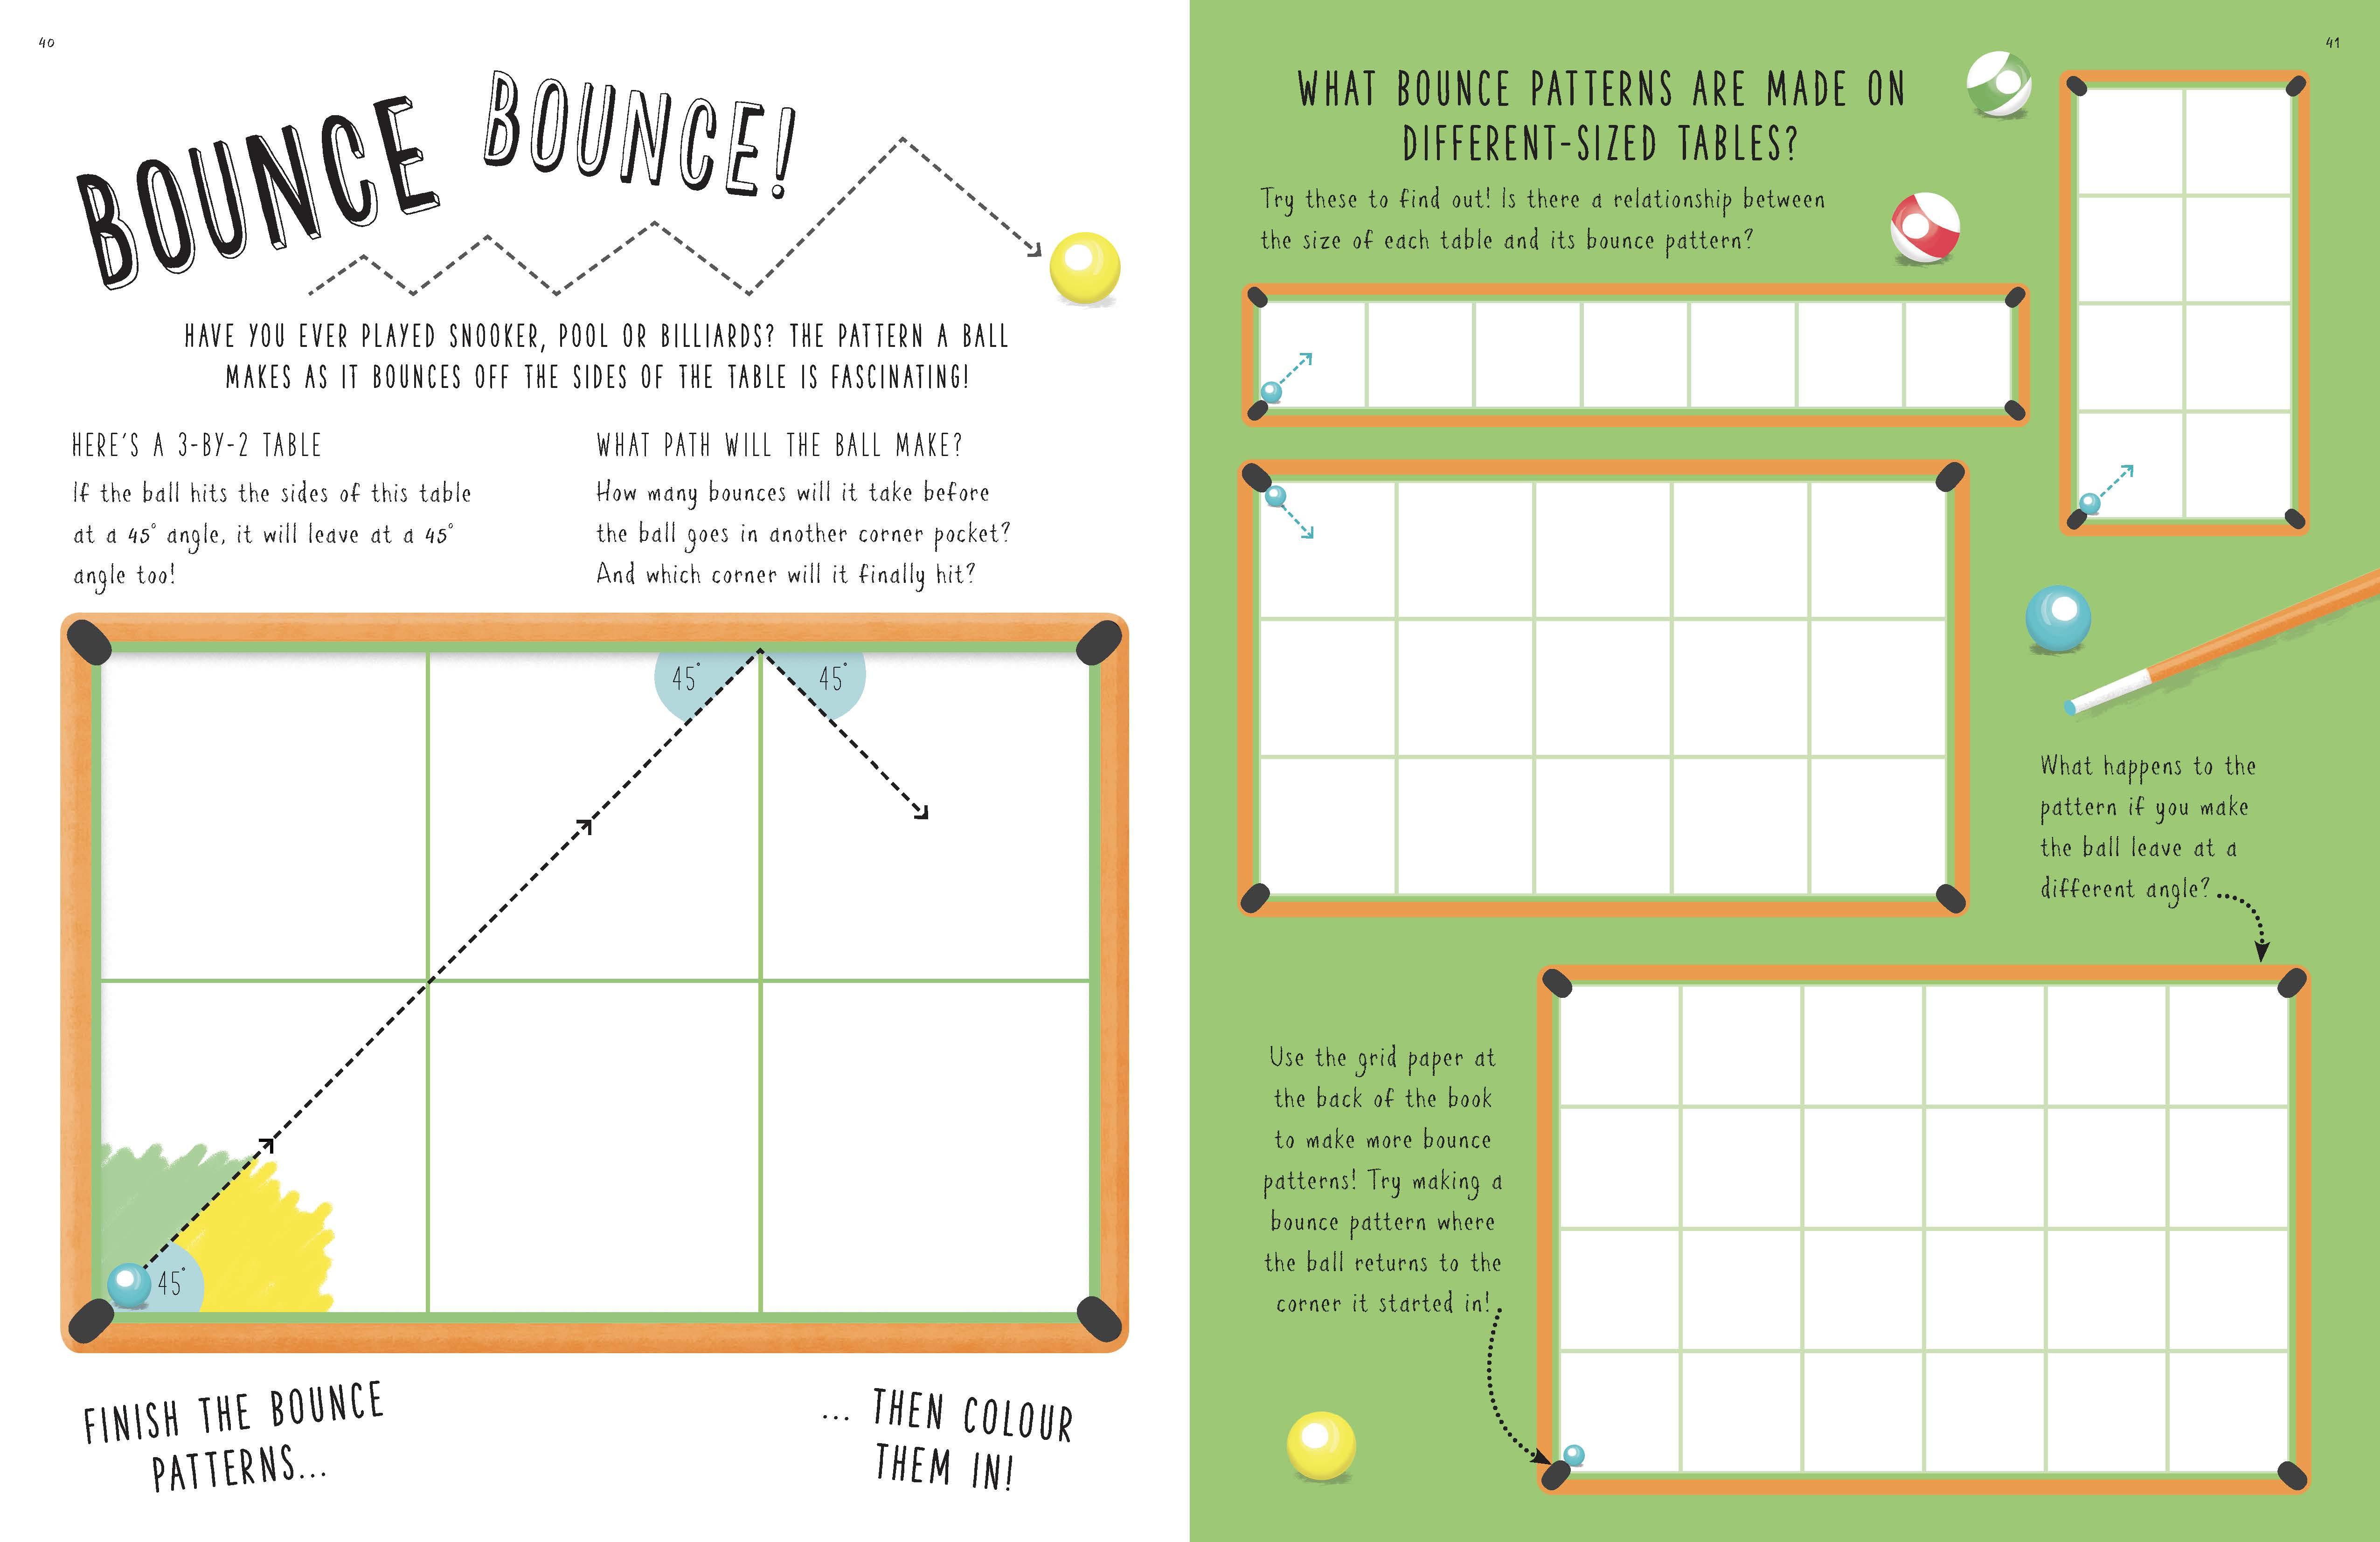 Bounce bounce!